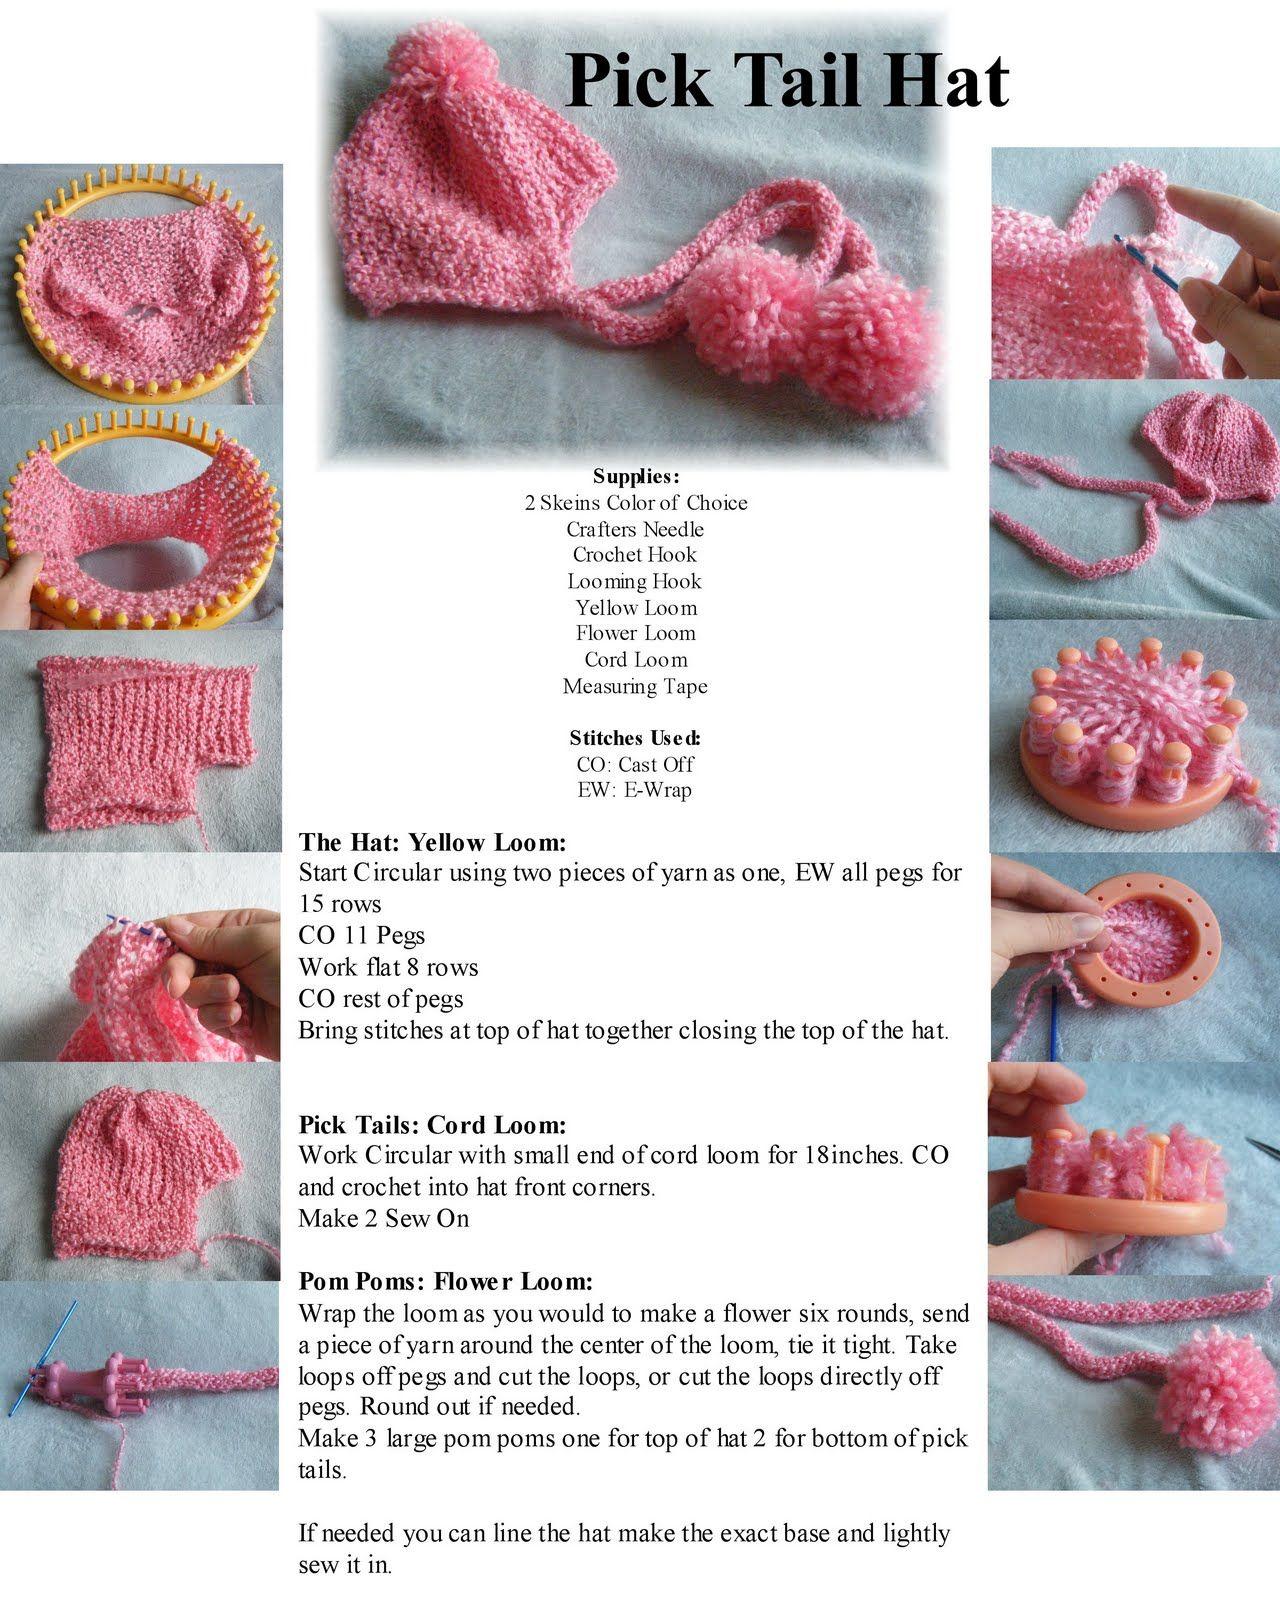 Pin by Tina Cranston on Knit & crochet | Pinterest | Loom Knitting ...